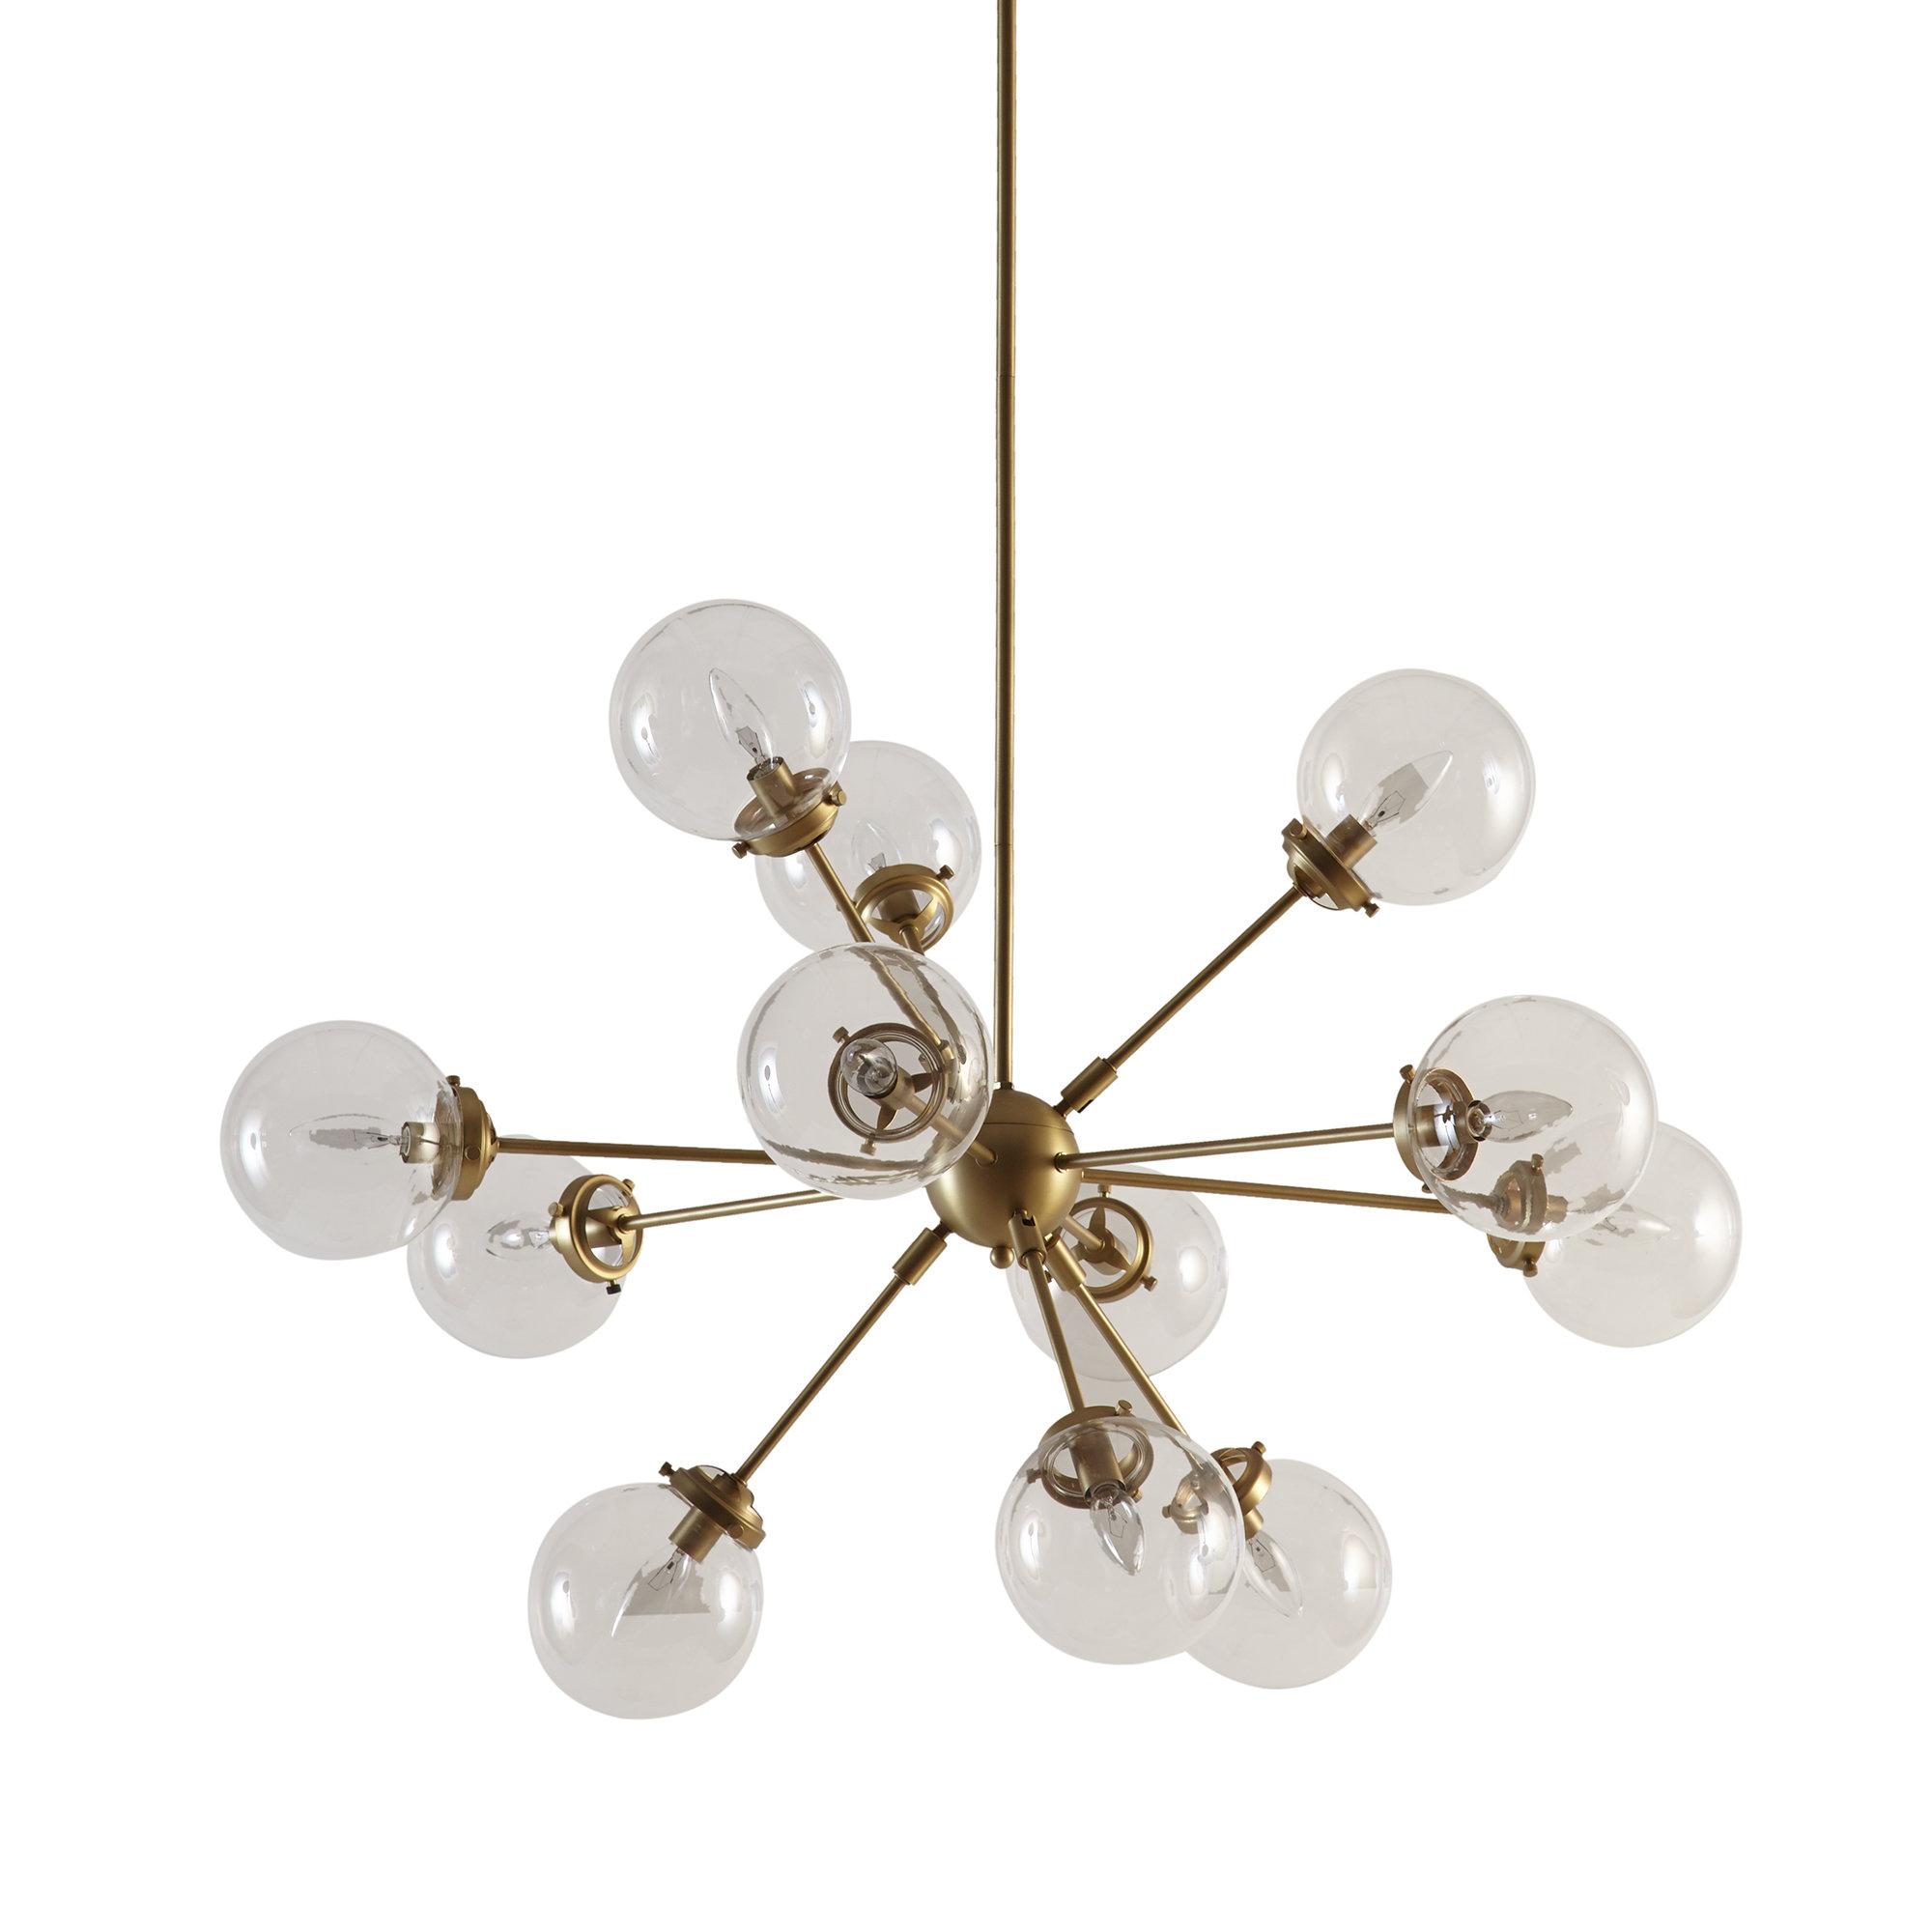 Modern Rustic Interiors Asher 12 Light Sputnik Chandelier In 2020 Defreitas 18 Light Sputnik Chandeliers (View 14 of 20)